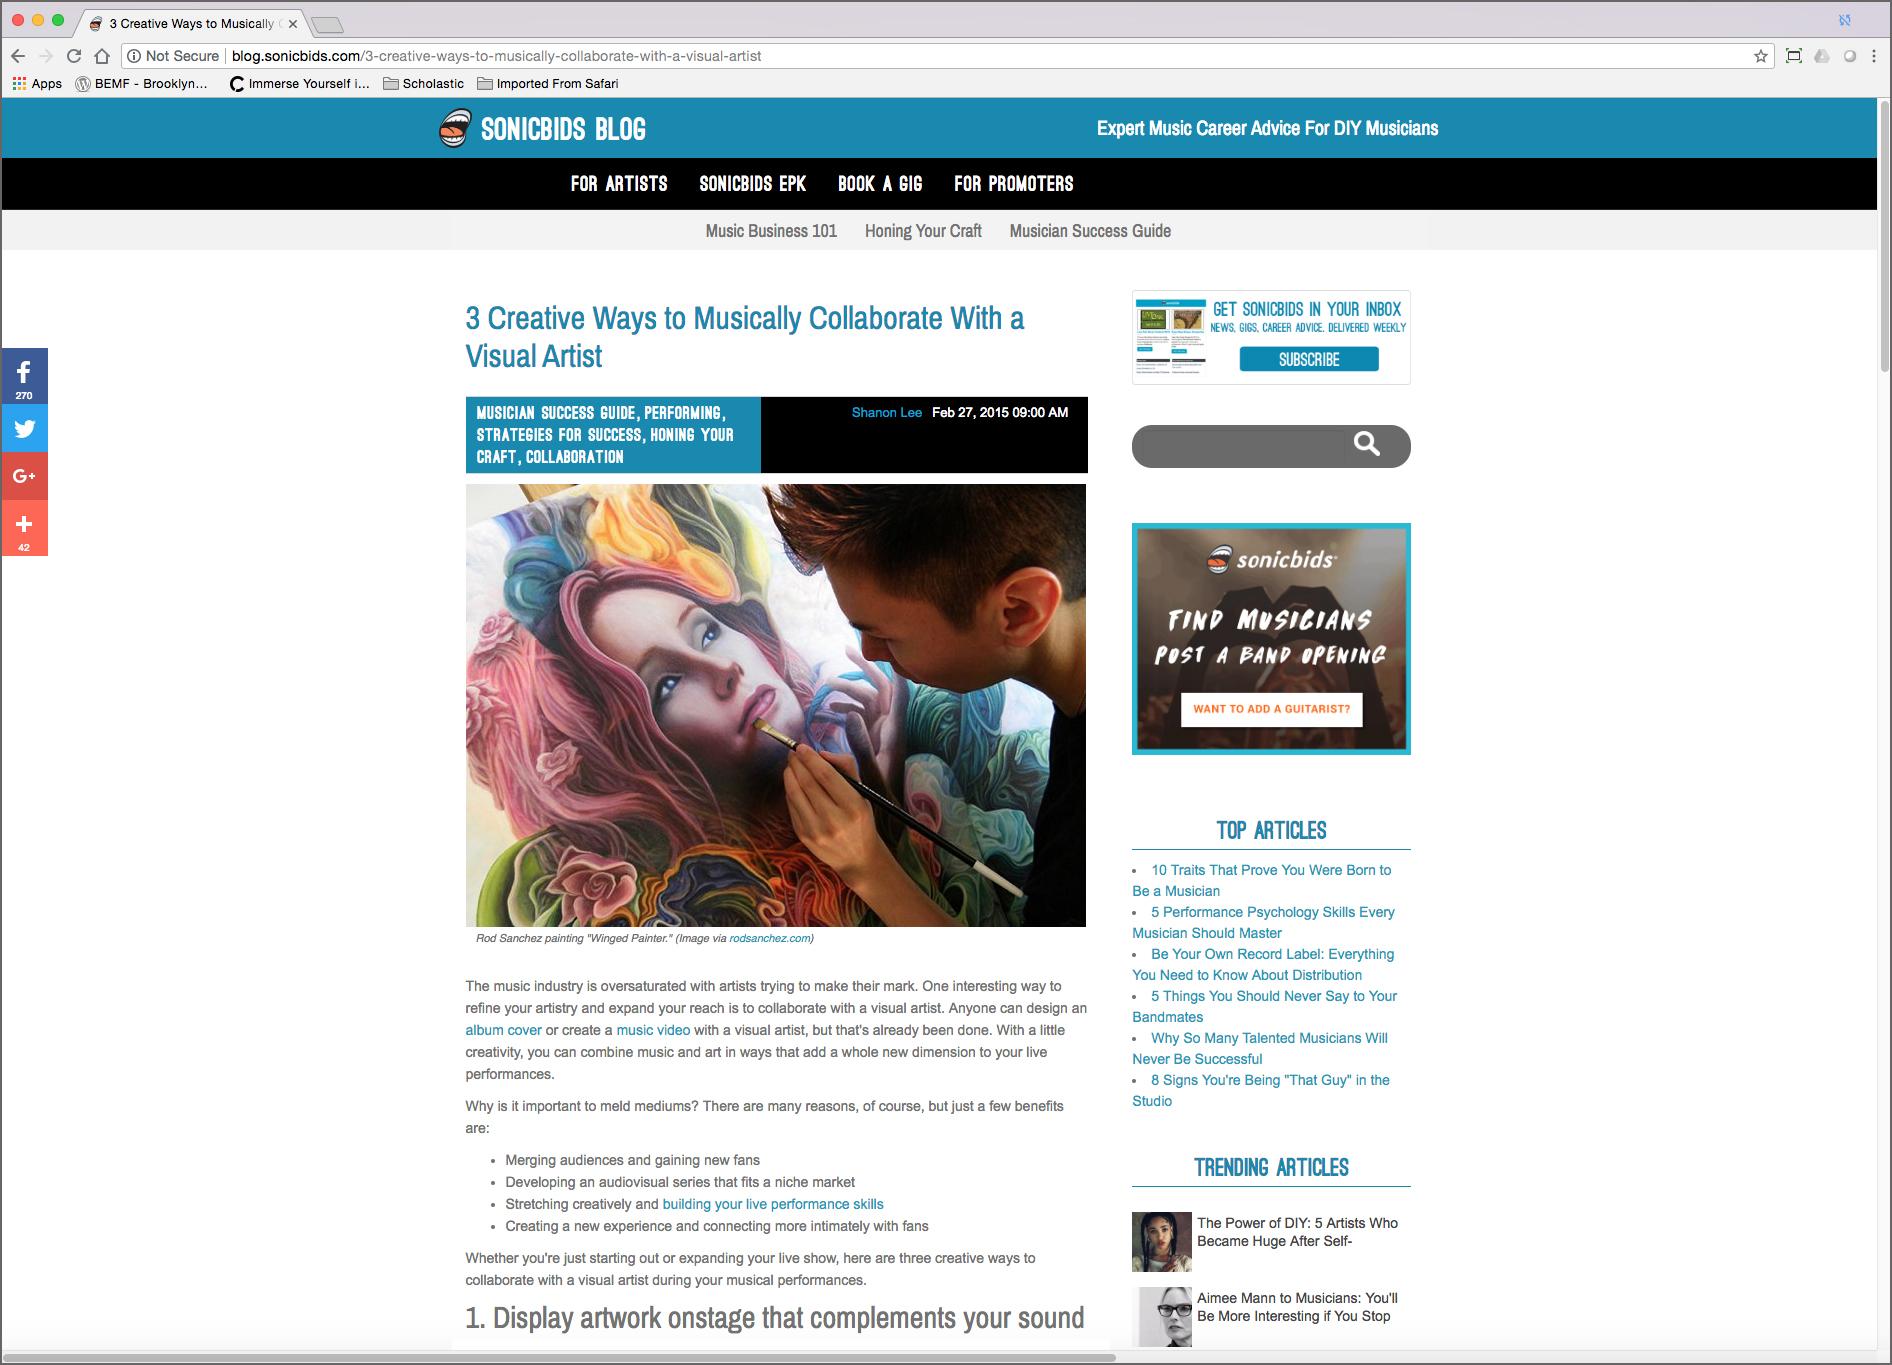 News_SonicBids_3CreativeWaystoMusicallyCollabwithVisualArtist_RaulSanchez_RodSanchez_Sanchez2winz.jpg